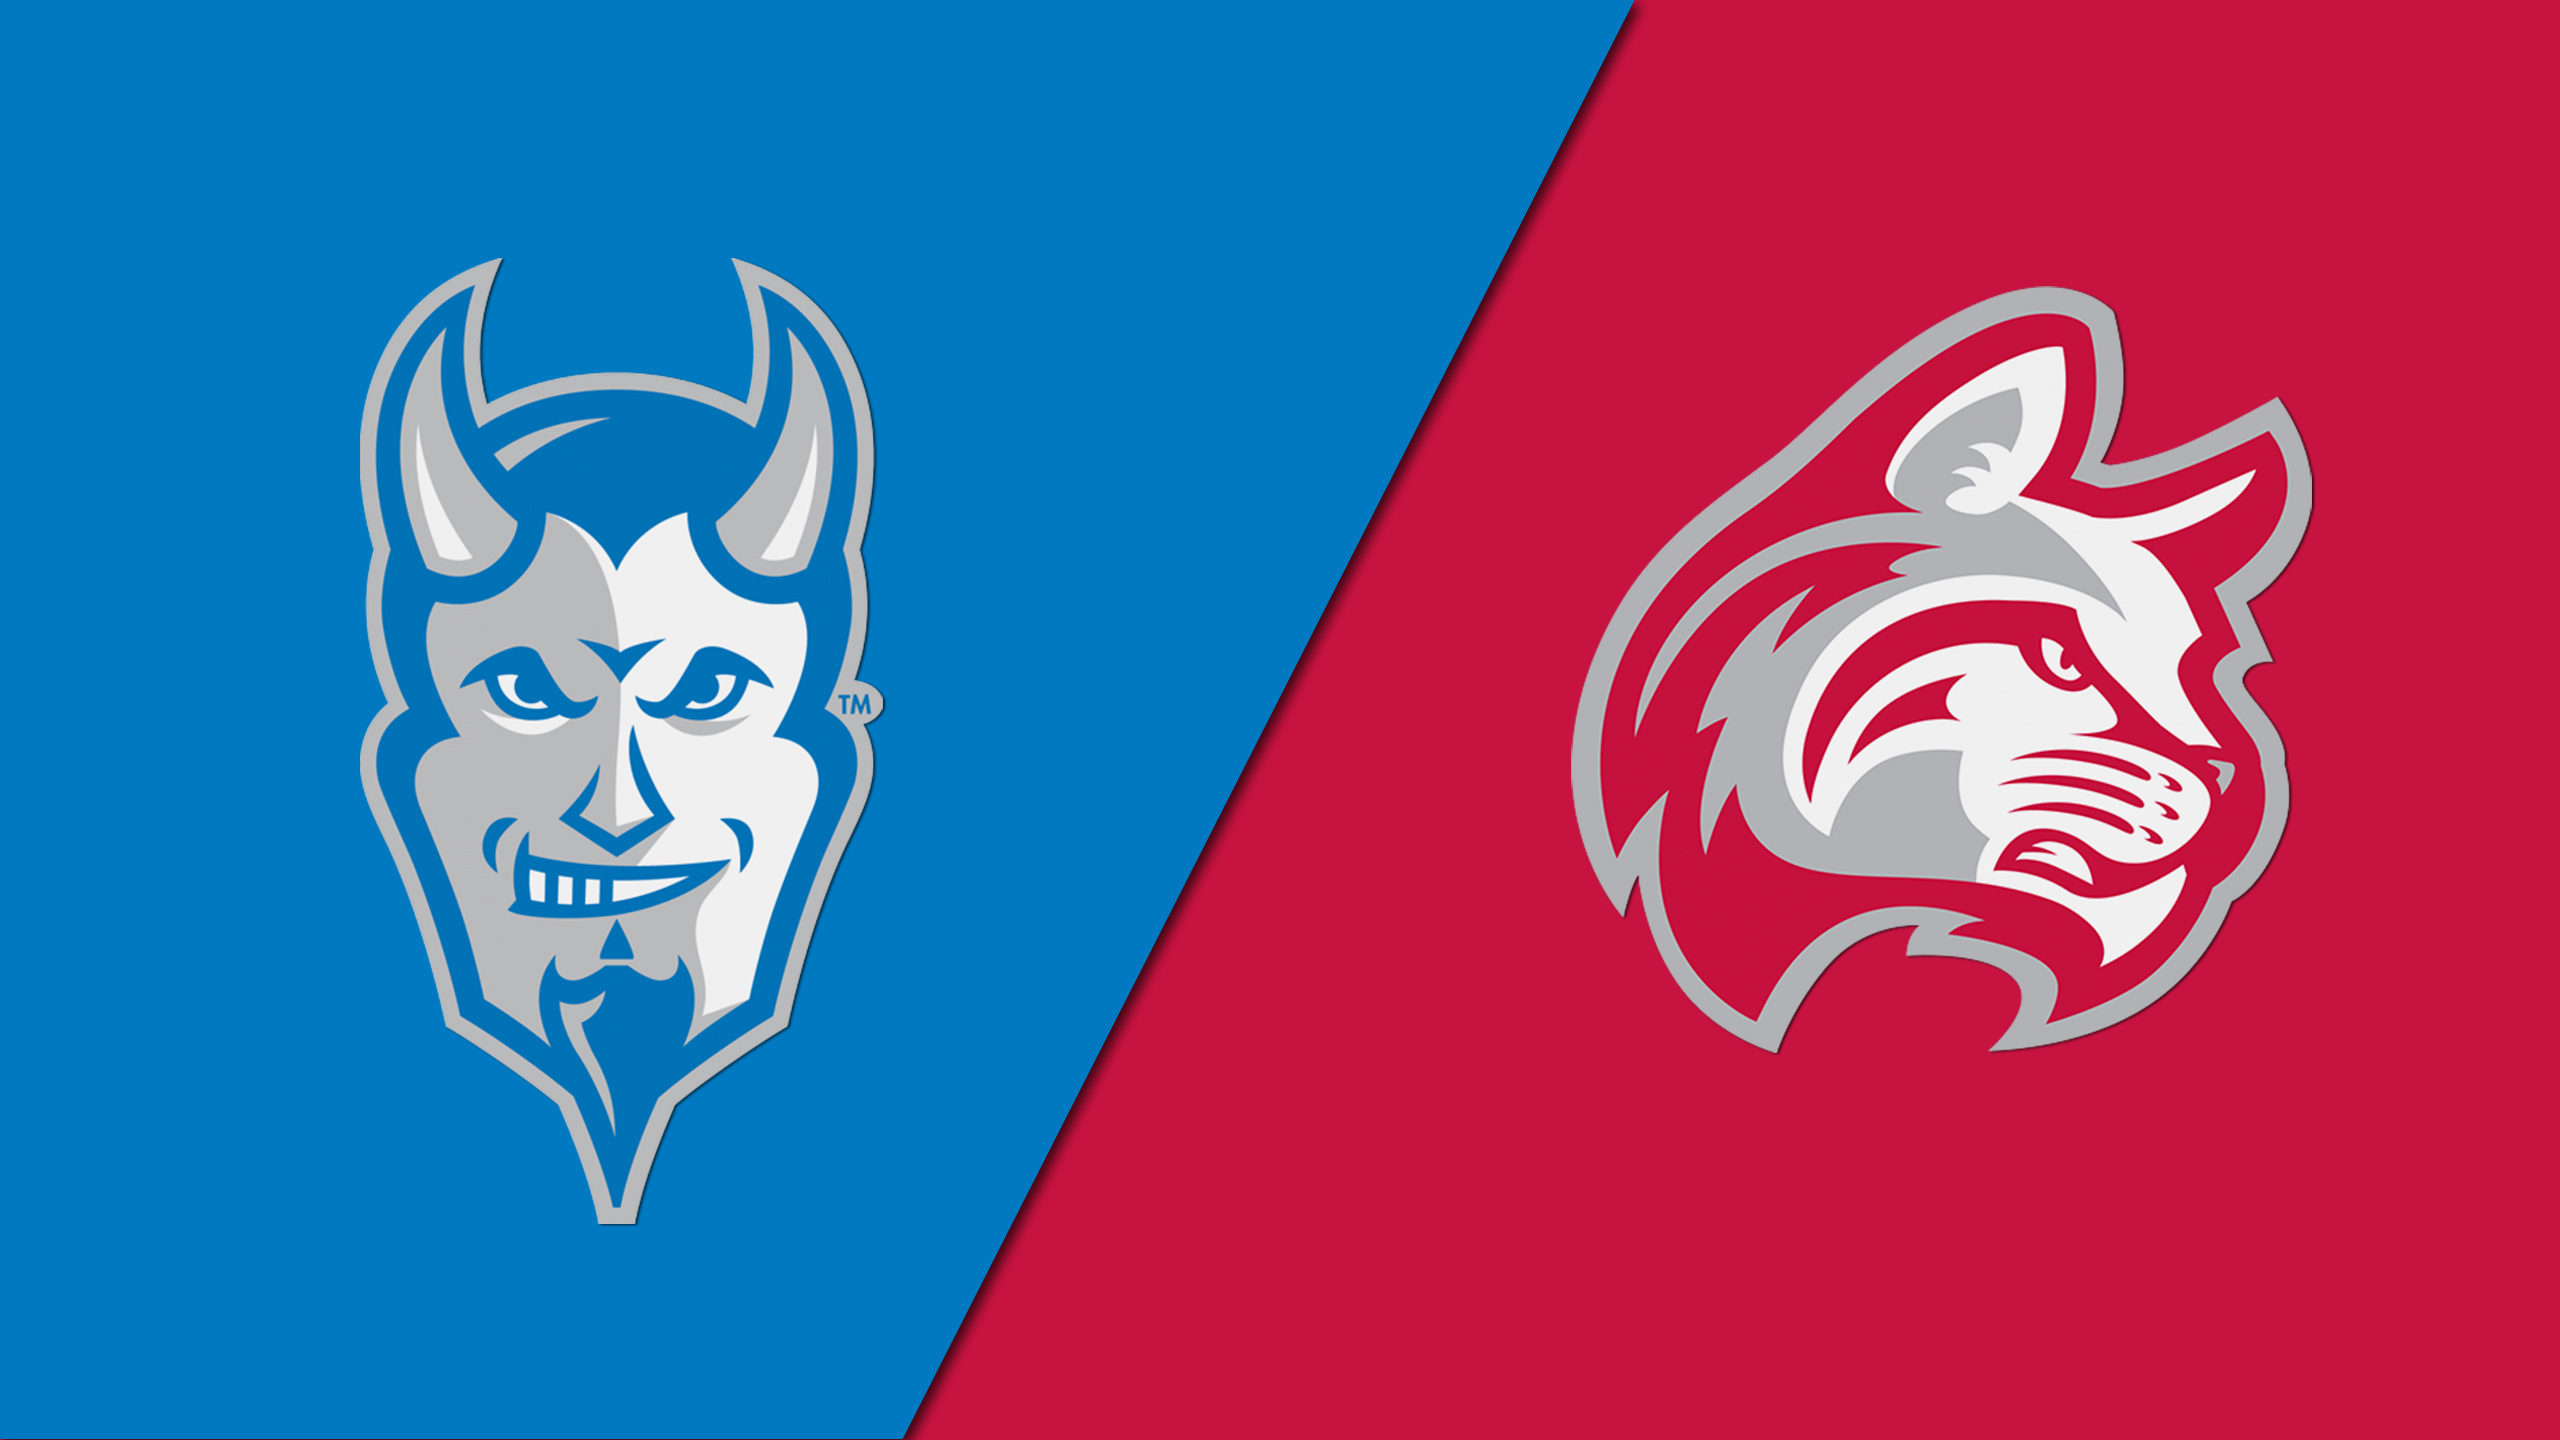 Lawrence Tech vs. Indiana Wesleyan University (Football)